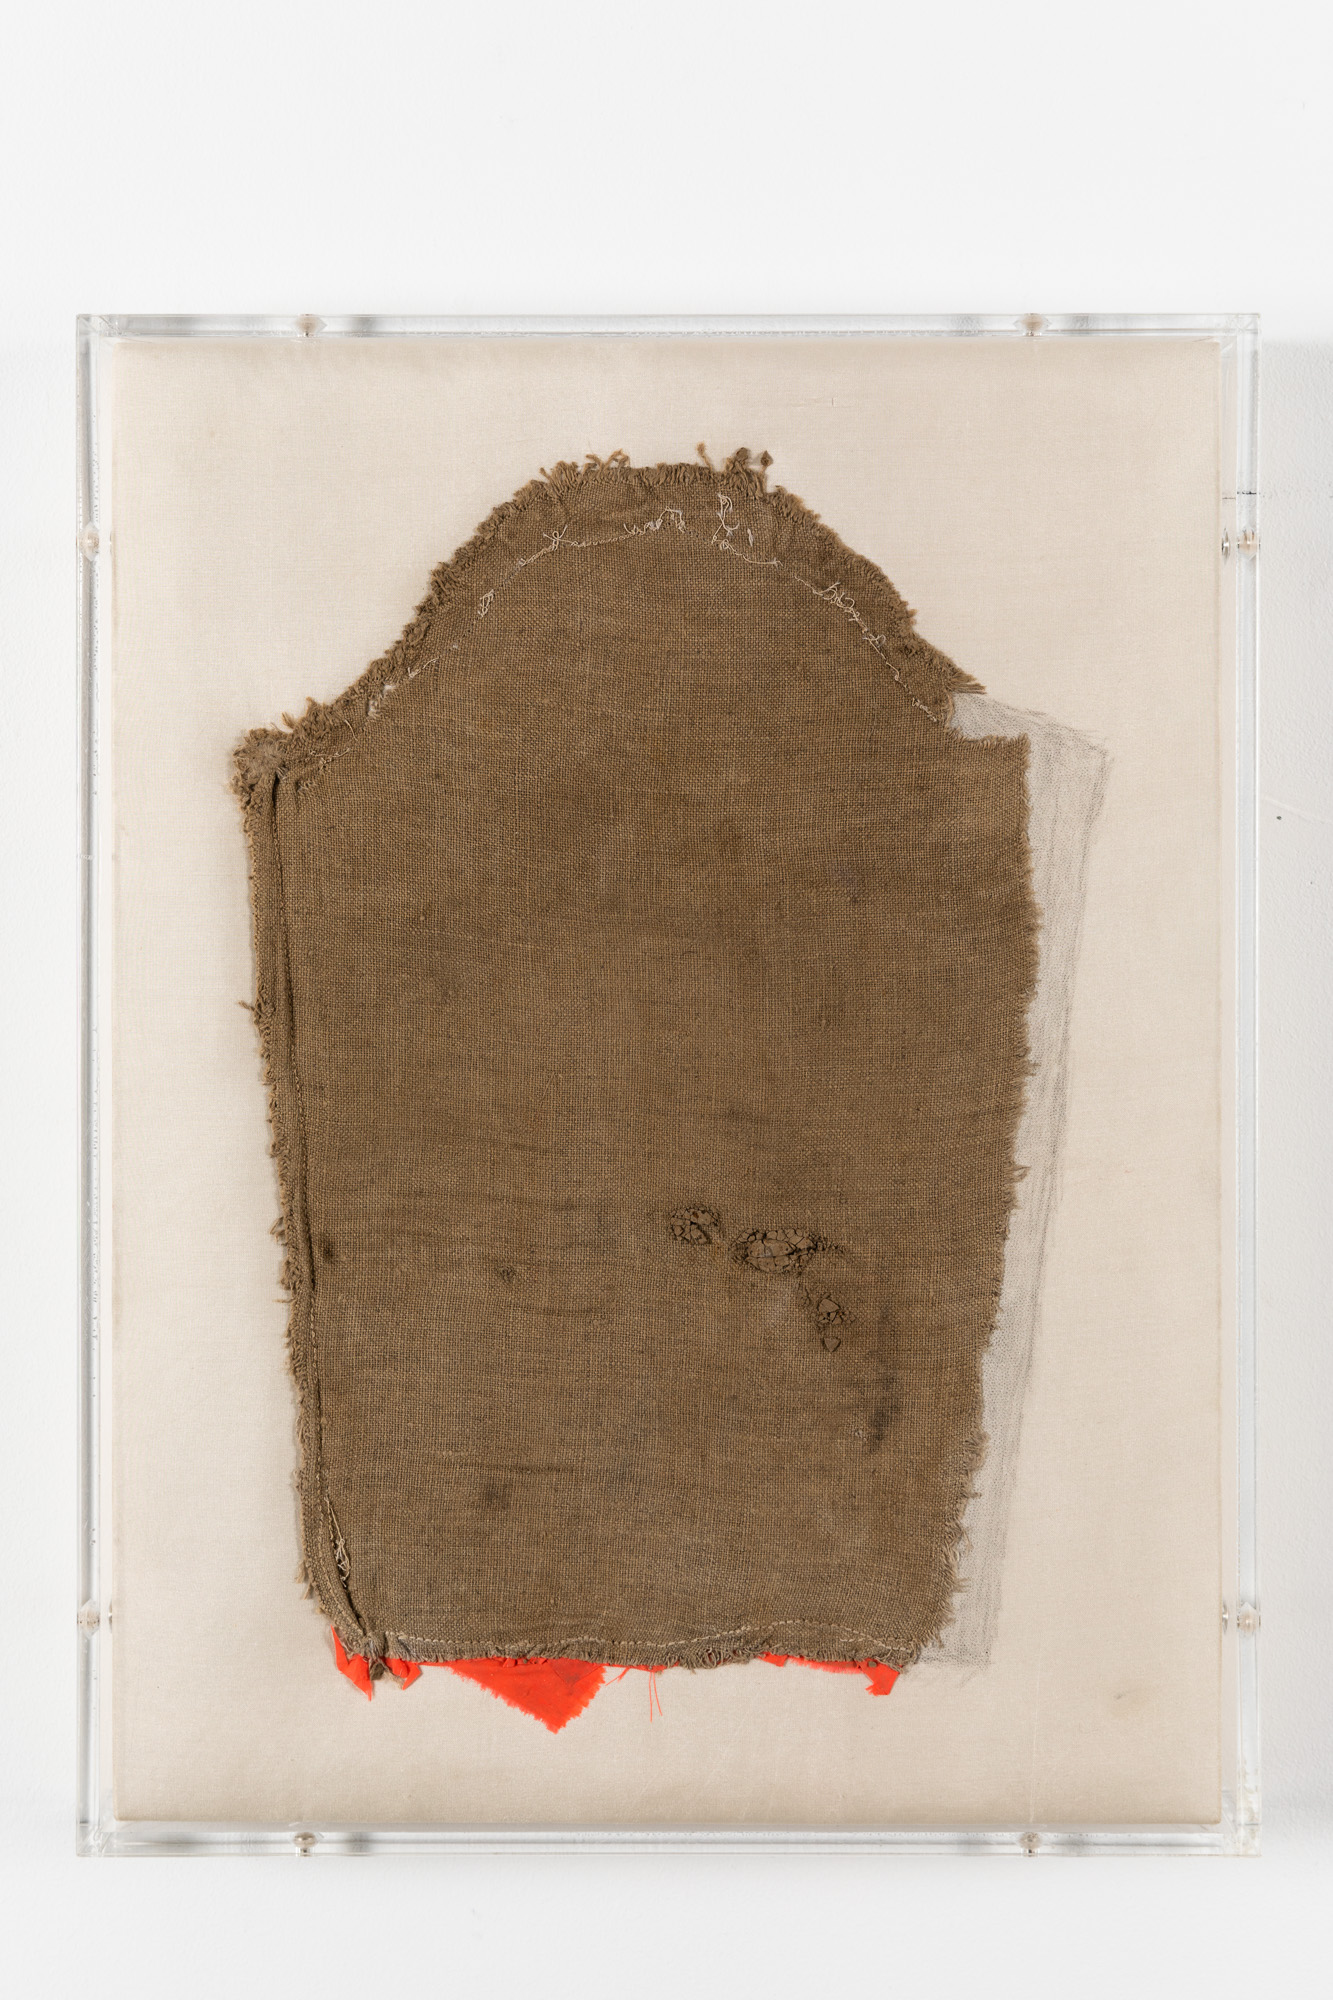 Minimal Information Light, 2020. Textile in artist's frame (plexiglass, wood and aluminum), 41,5 x 31,5 x 4,5 cm